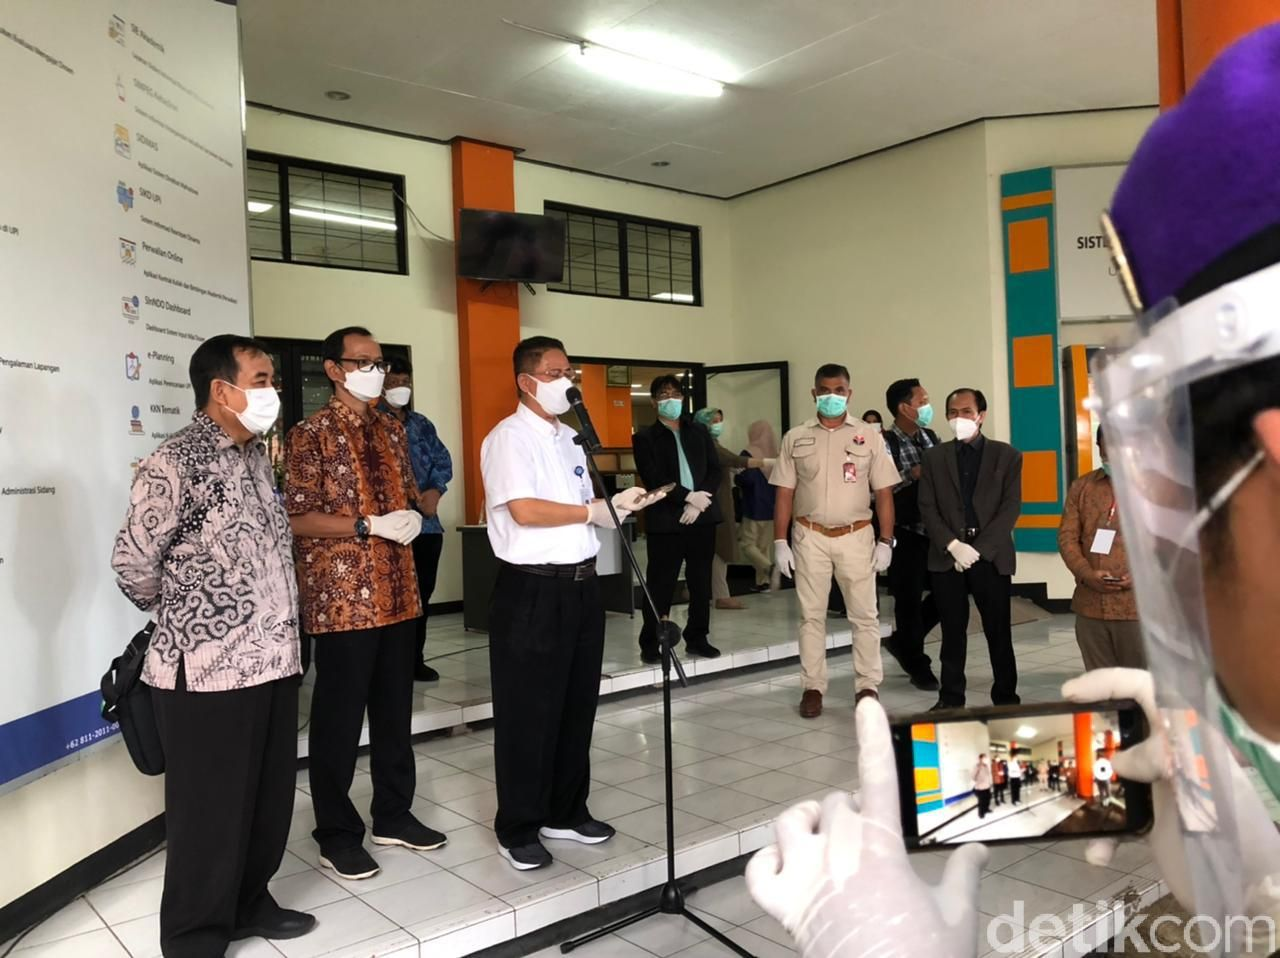 (kemeja putih) Ketua Pelaksana Eksekutif Lembaga Tes Masuk Perguruan Tinggi (LTPMT) Prof. Dr. Budi Prasetyo Widyobroto)